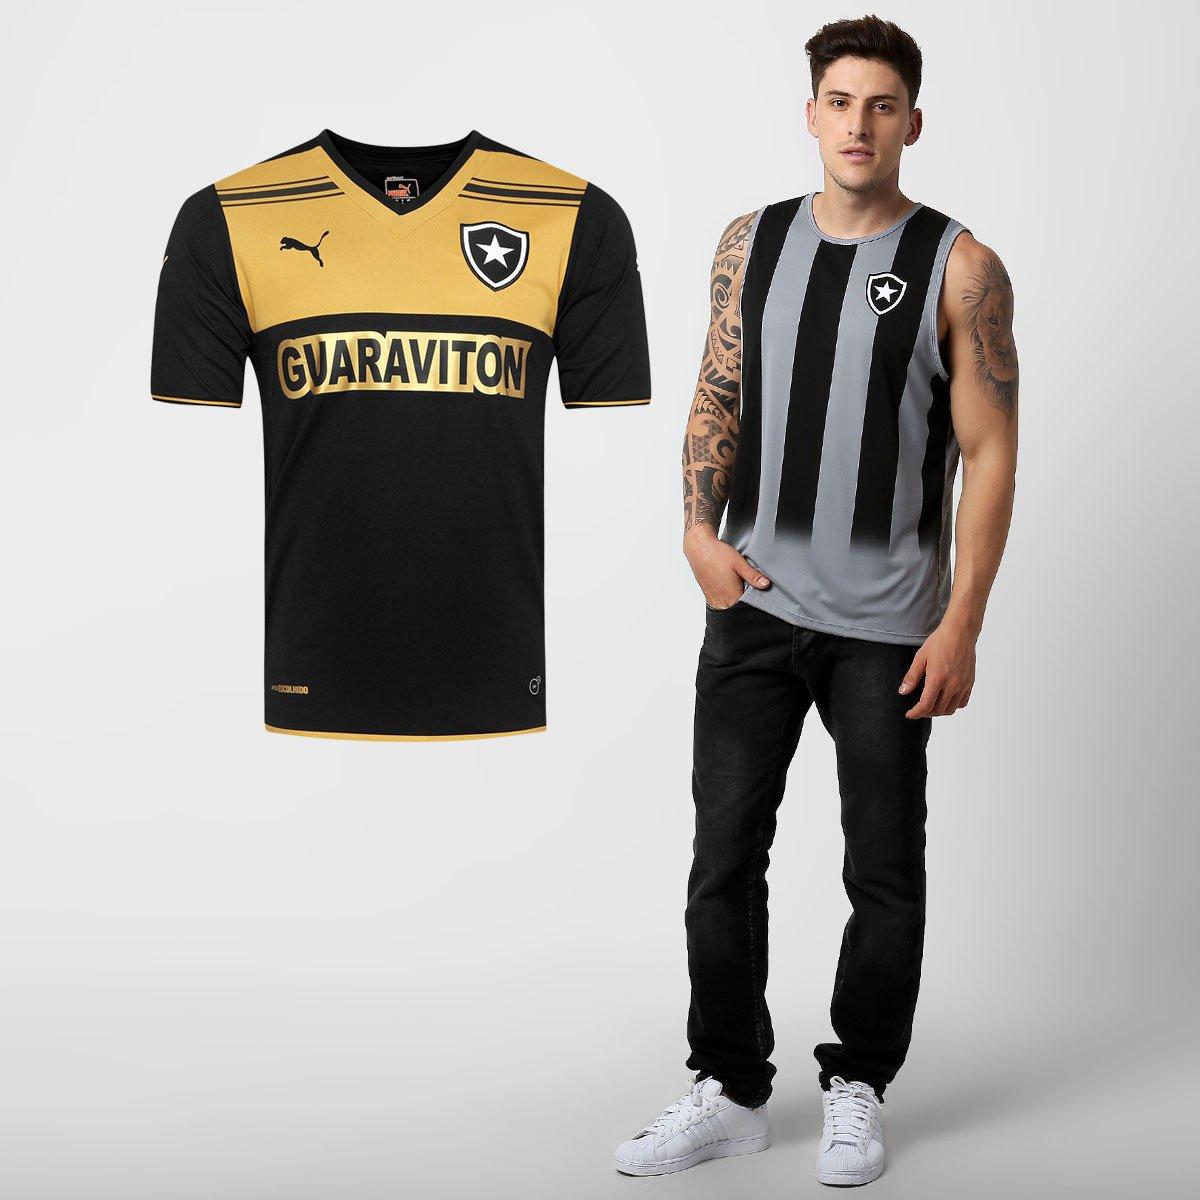 Kit Botafogo - Camisa Puma Botafogo II 14 15 + Regata Glorioso - Compre  Agora  8033b0343994f